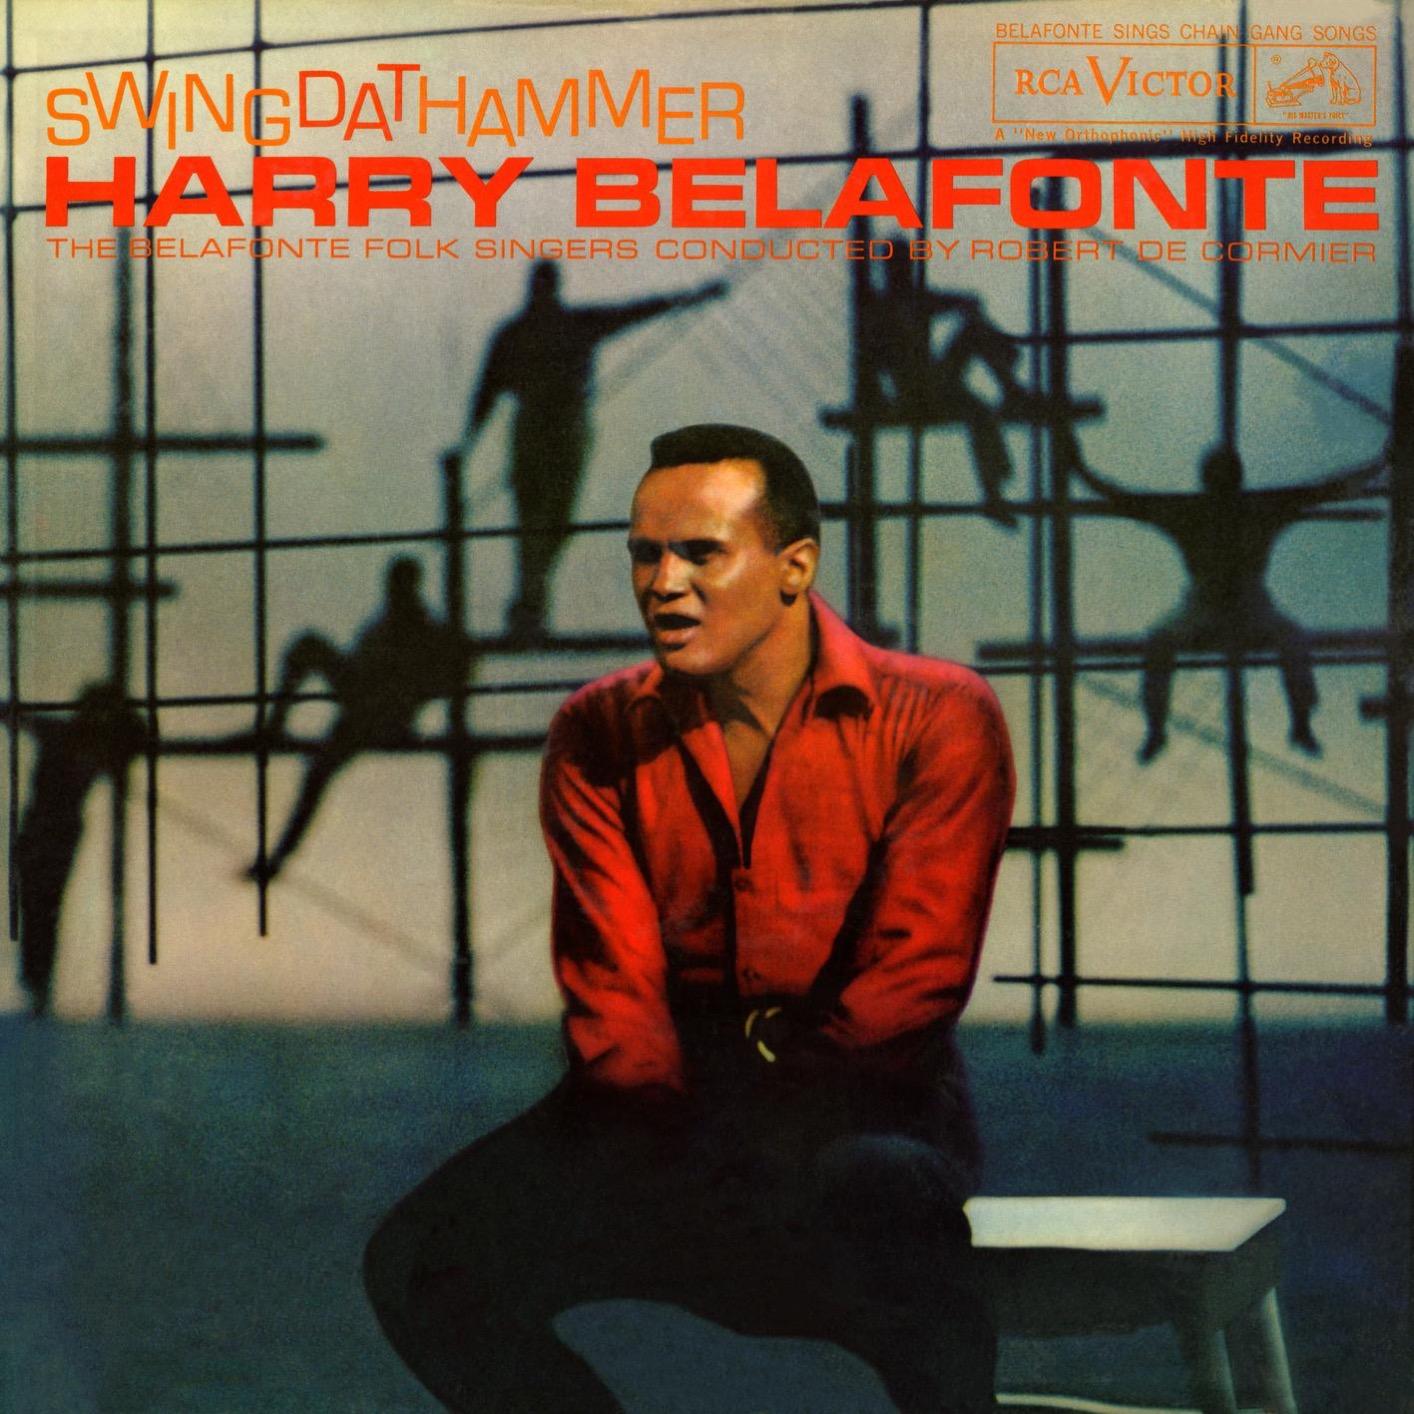 Swing Dat Hammer (Remastered) | HIGHRESAUDIO